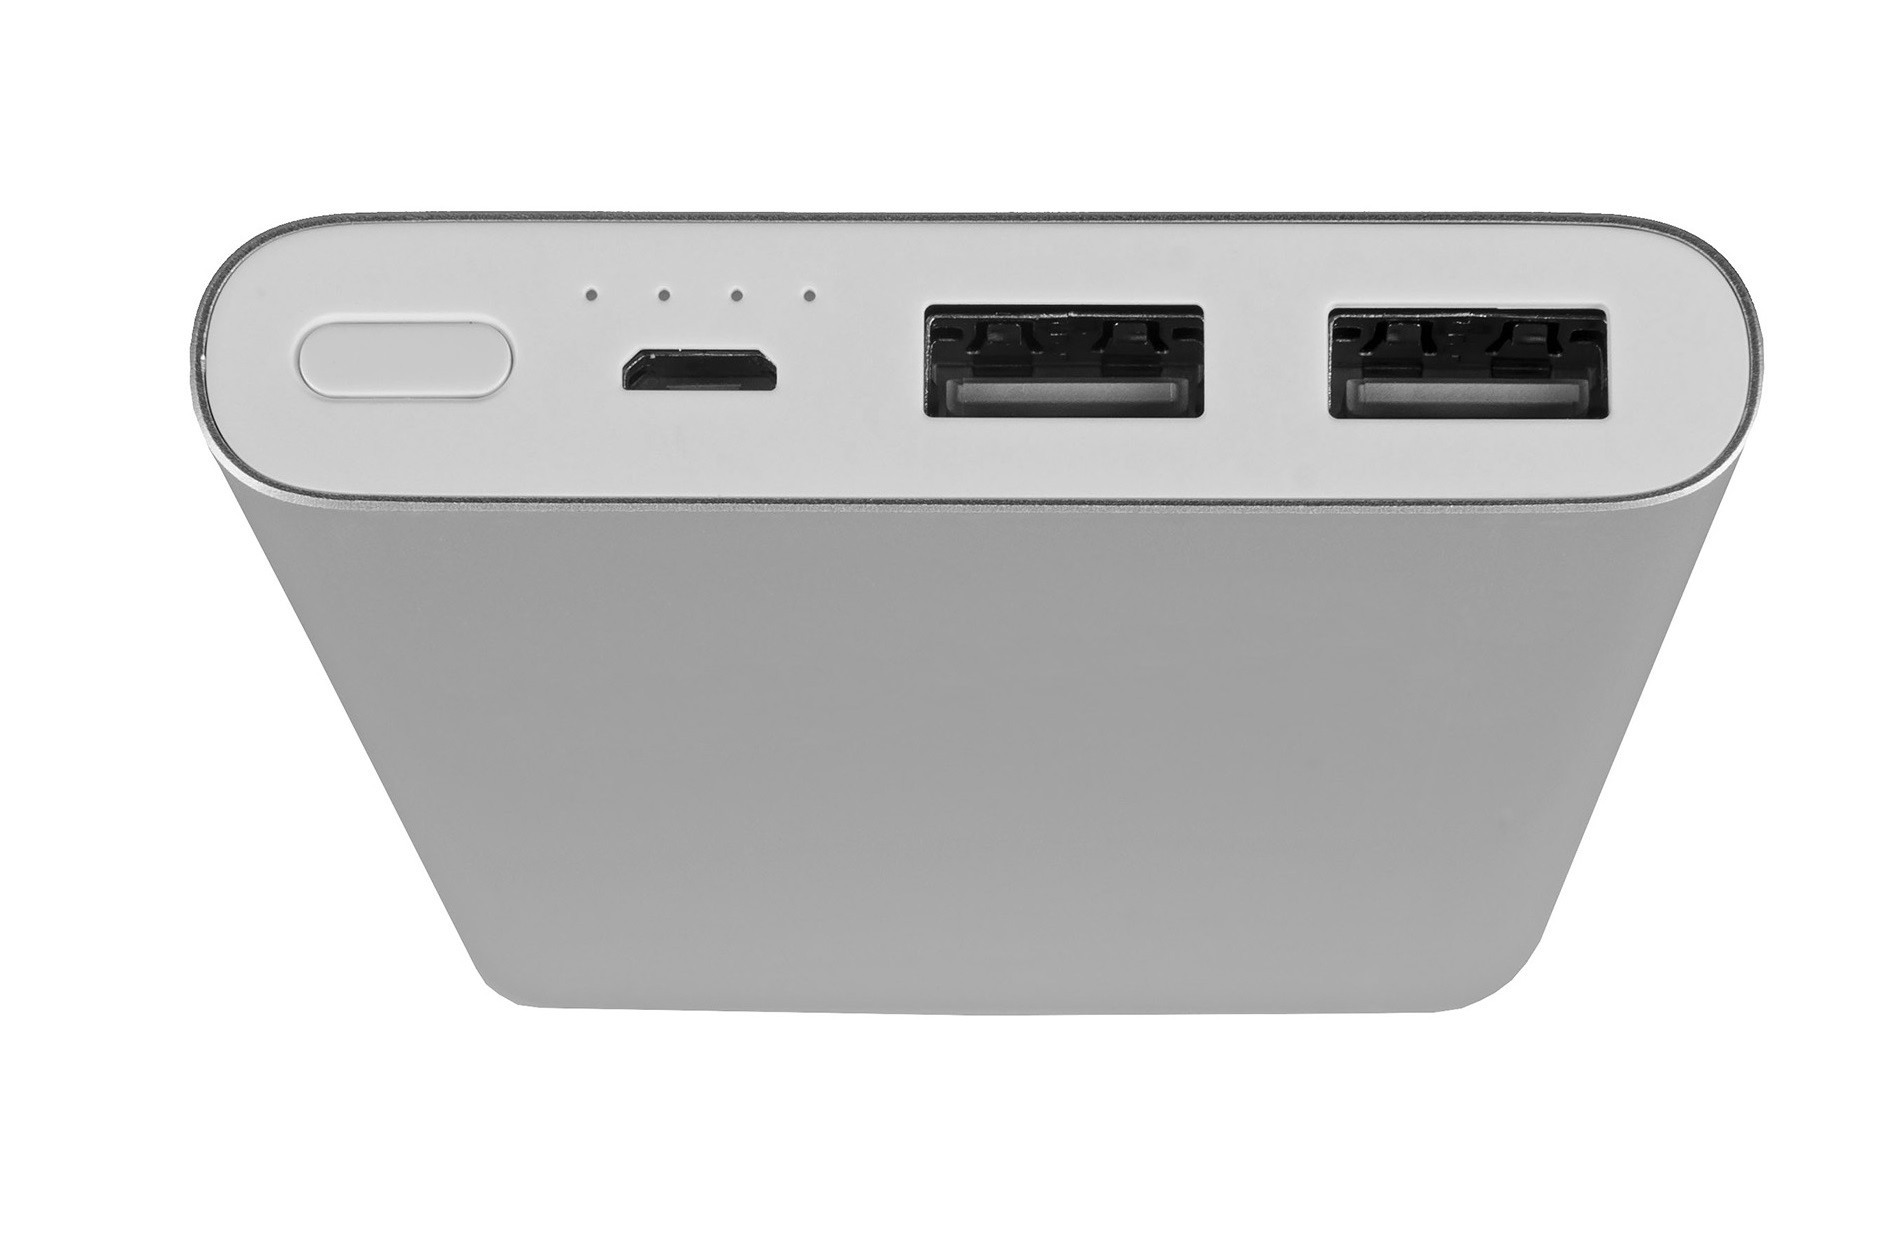 SET:  Power Bank Xiaomi Mi 2i 10 000 mAh Quick Charge 3.0 + CASE